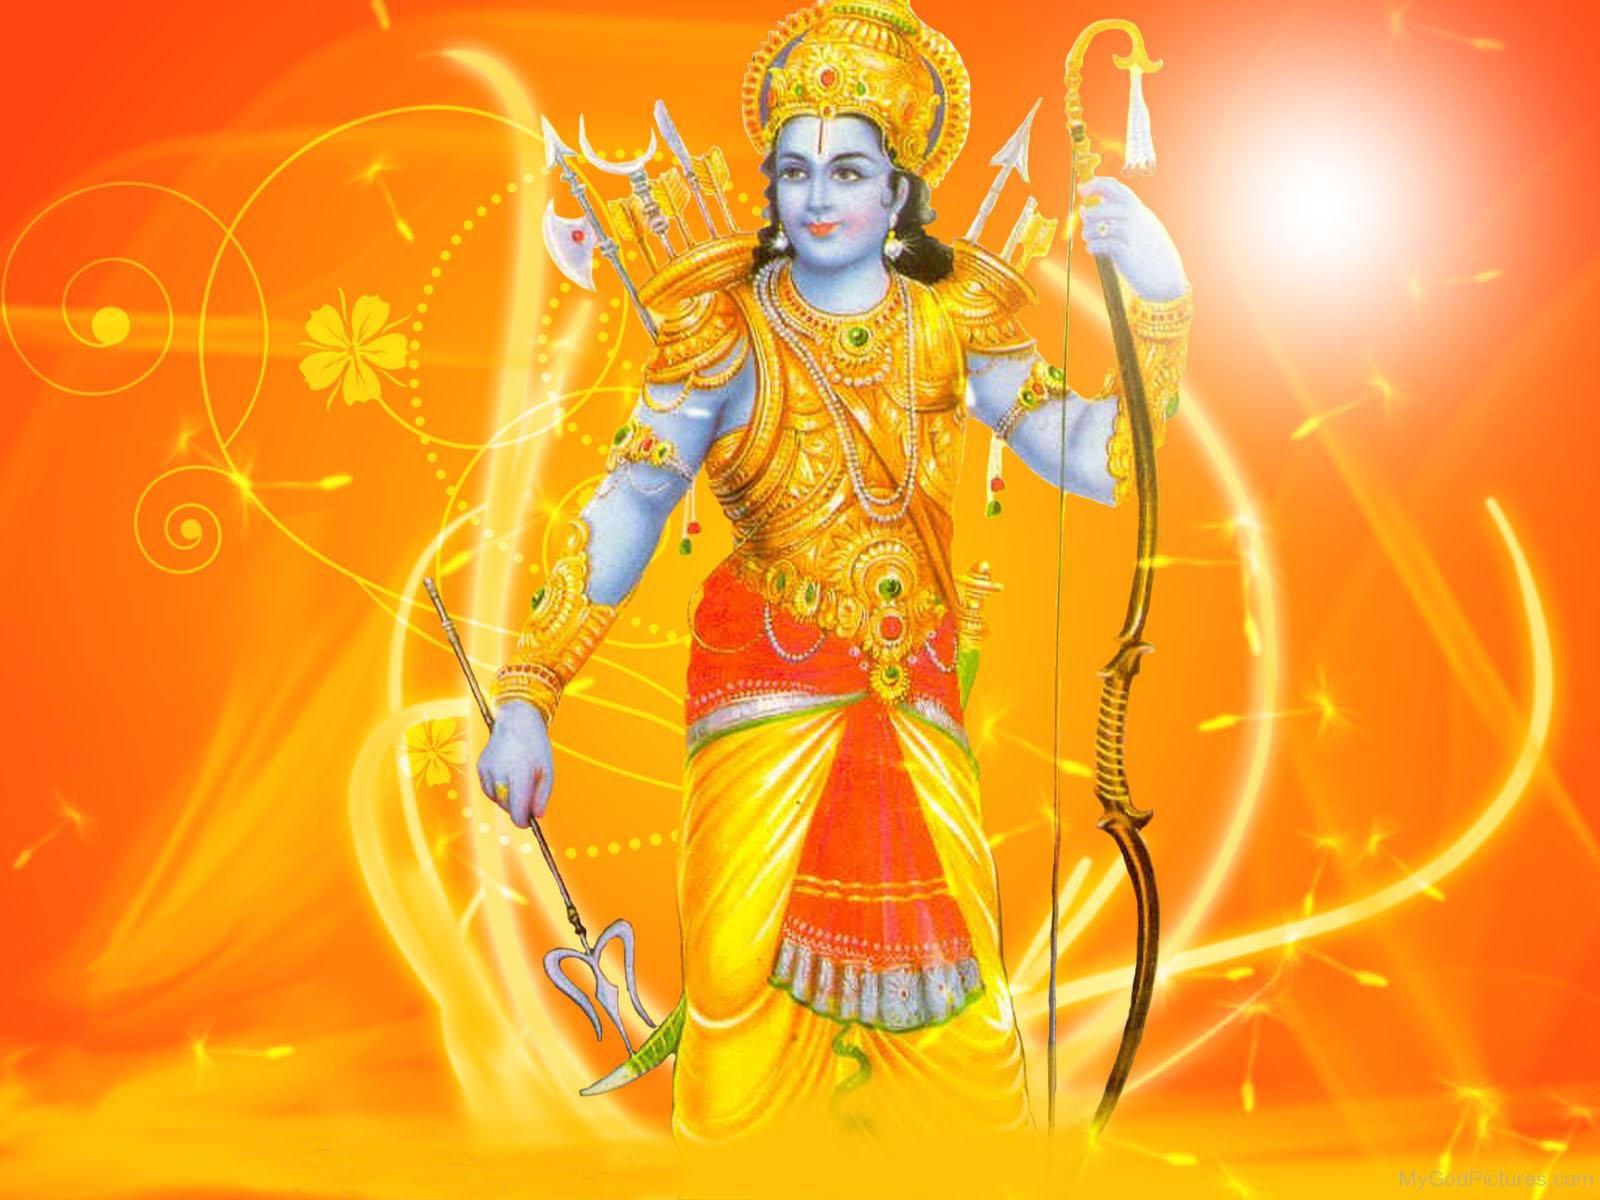 Lord rama original photo Who was Rama Myth or Historical Hero